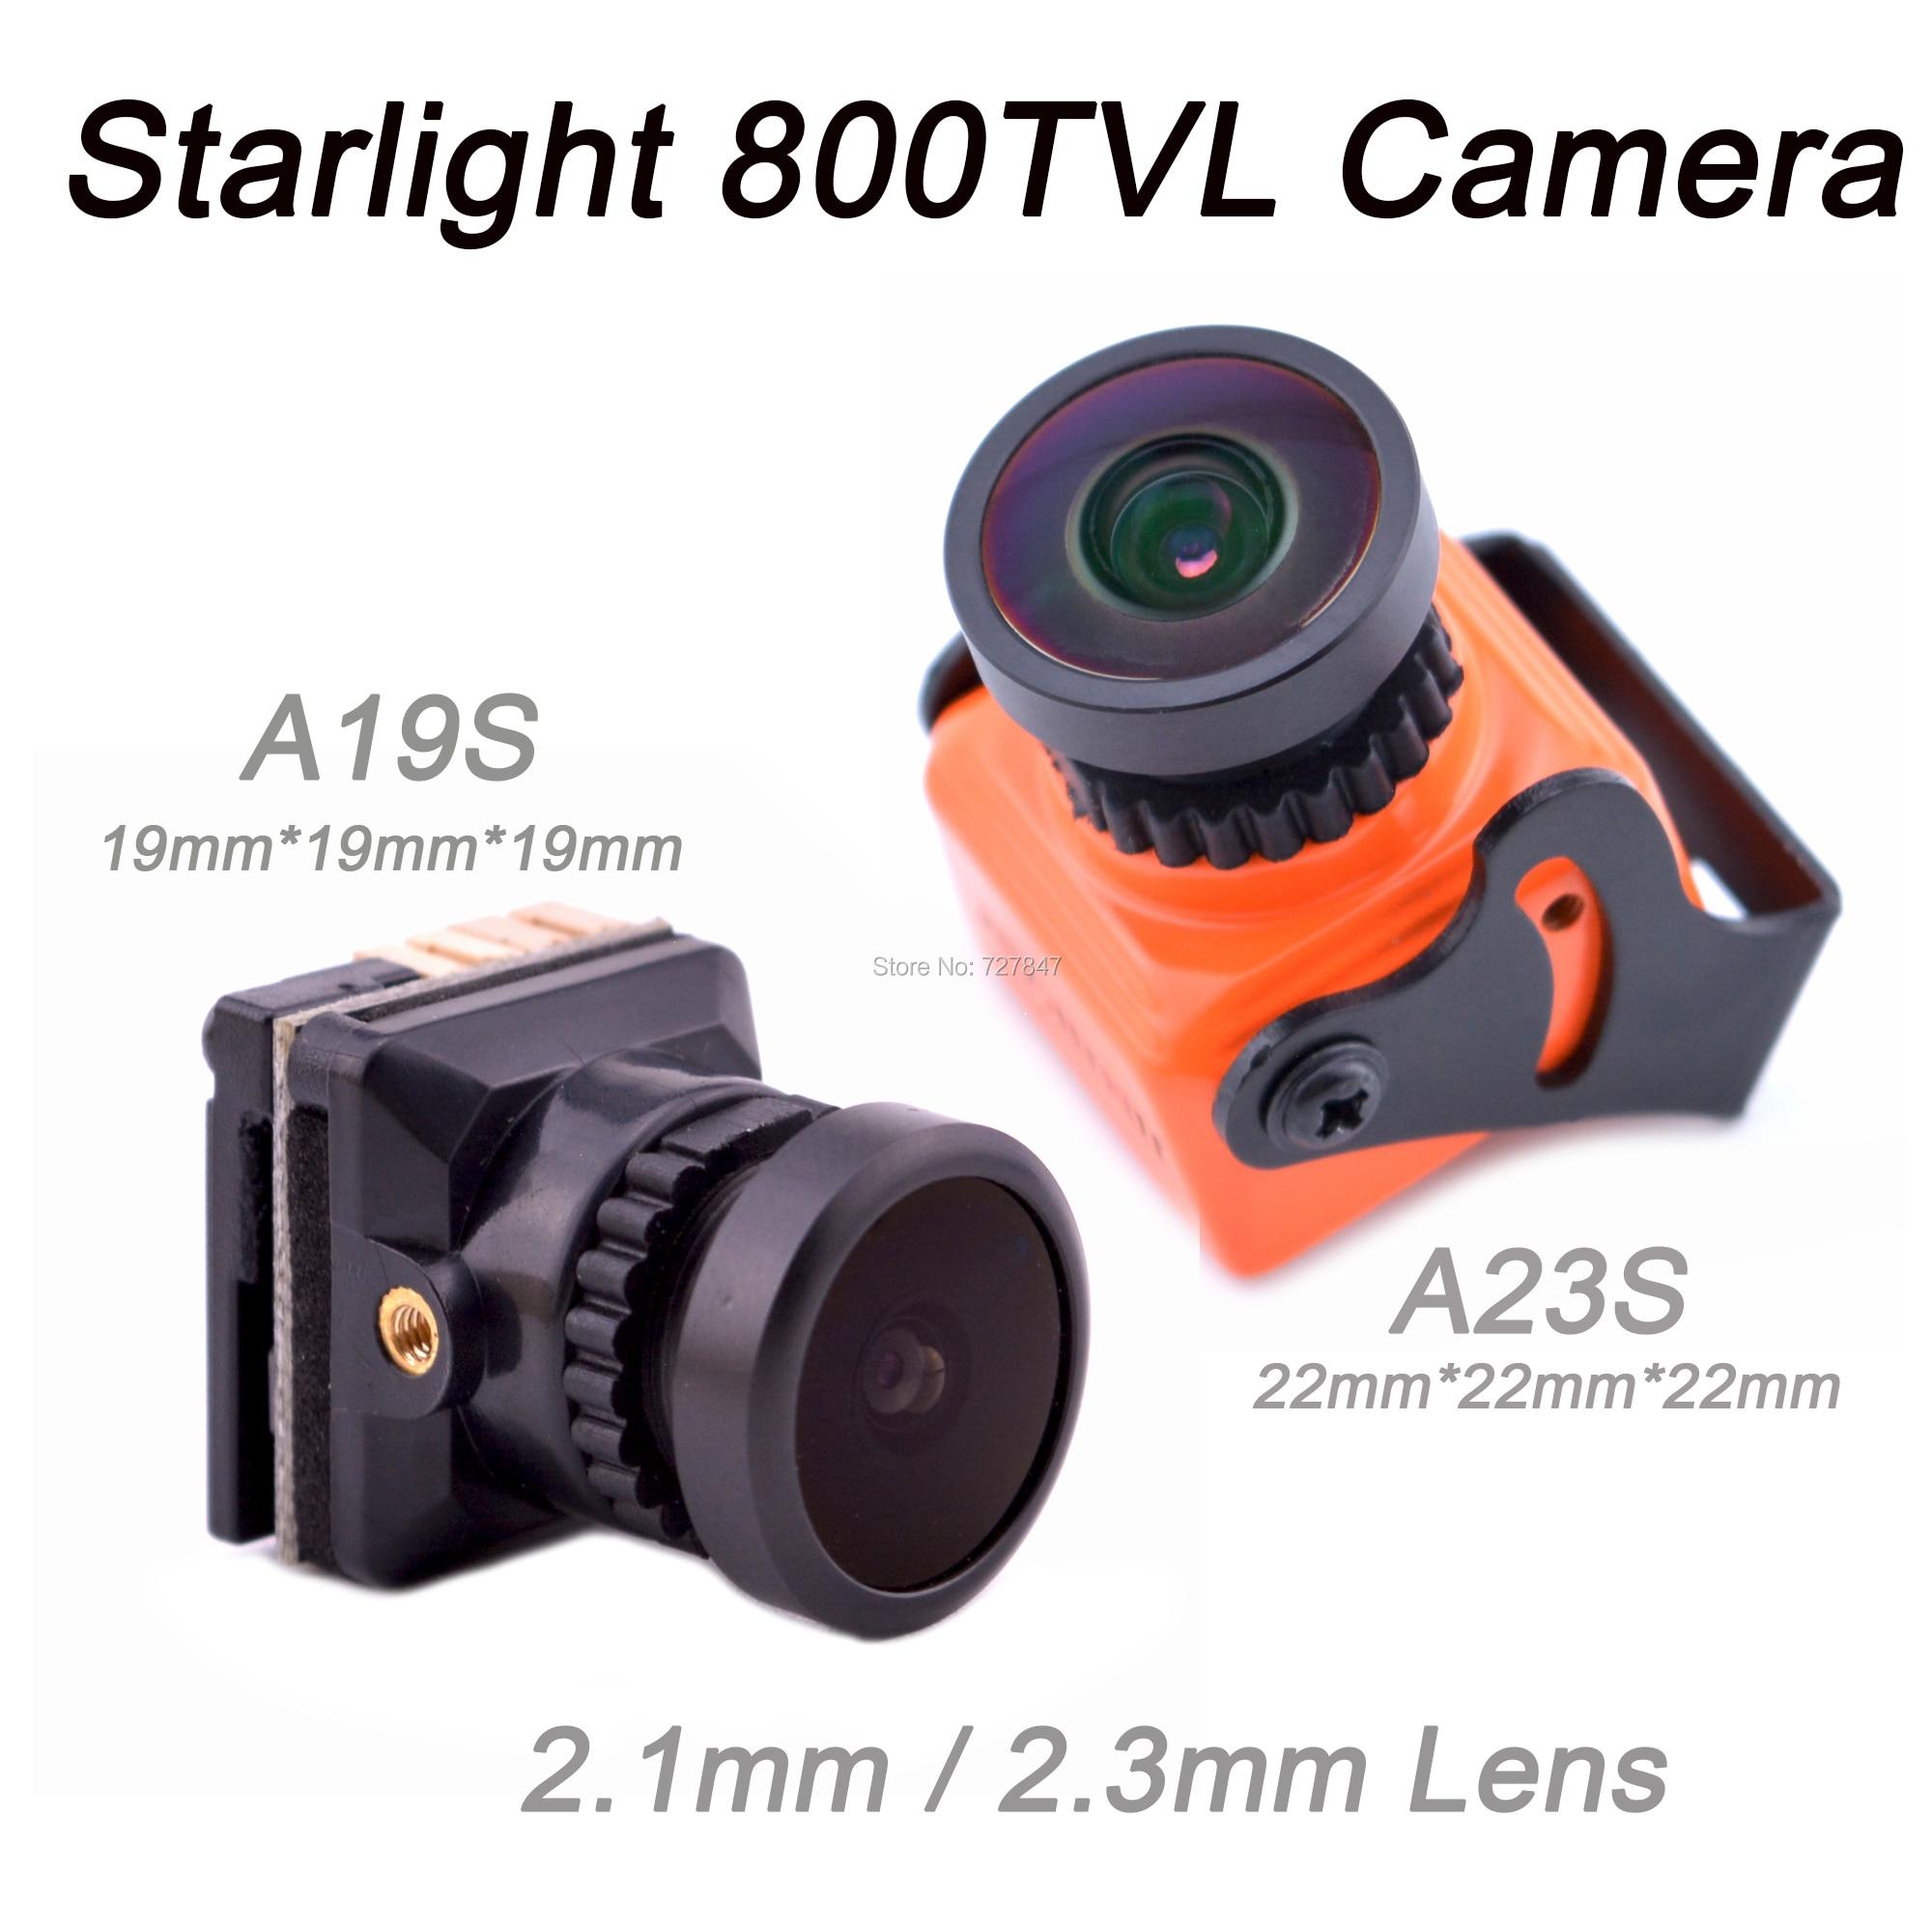 NEW Starlight 800TVL 1/1.8'' Level sensor OSD FPV camera NTSC/PAL Switchable 2.1mm / 2.3mm Lens FPV Camera for FPV Racing Drone